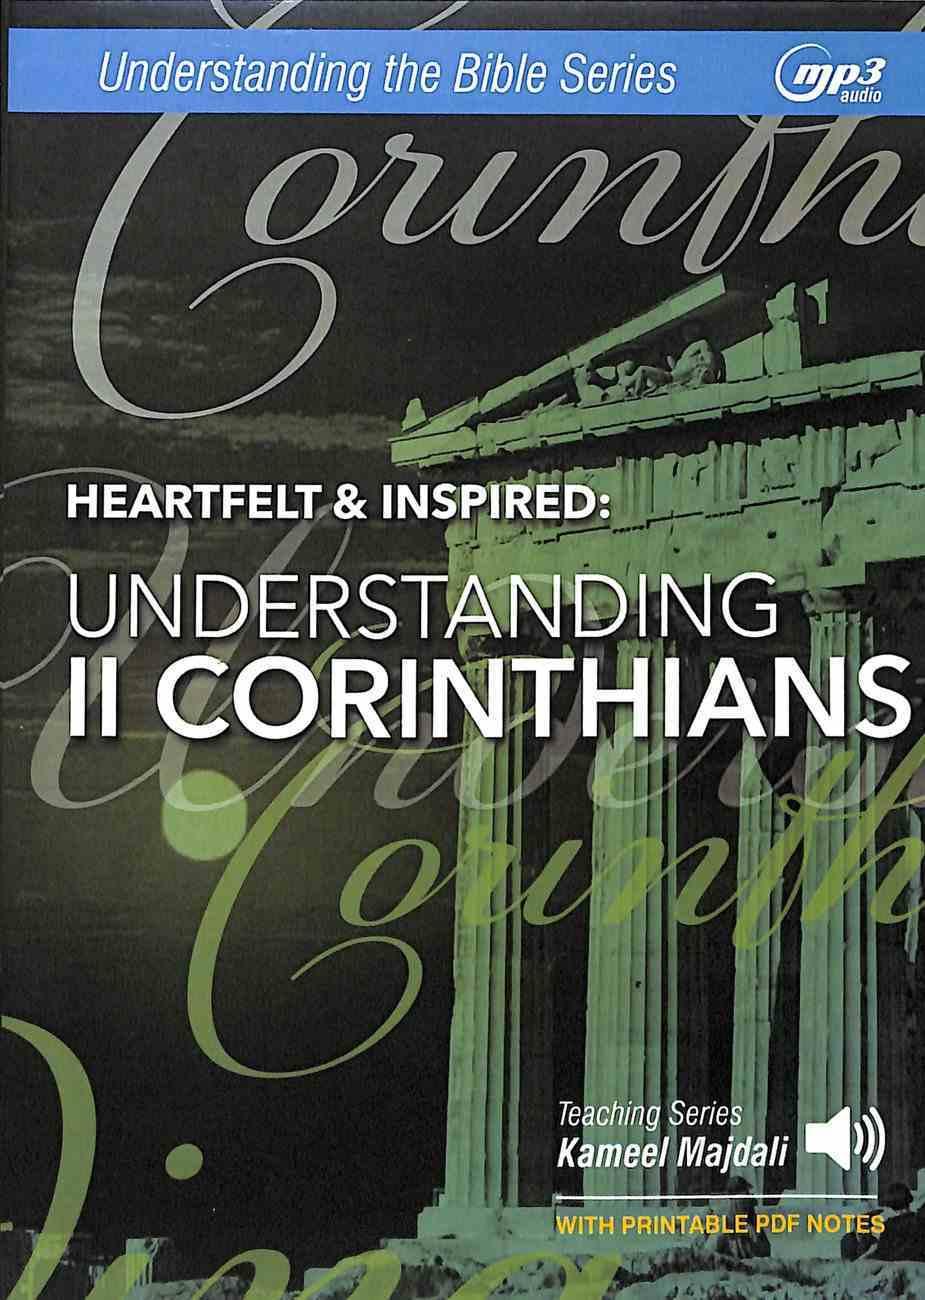 Heartfelt & Inspired : Understanding II Corinthians (With Printable Pdf Notes) (MP3 Audio, 16 Hrs) (Understanding The Bible Audio Series) CD